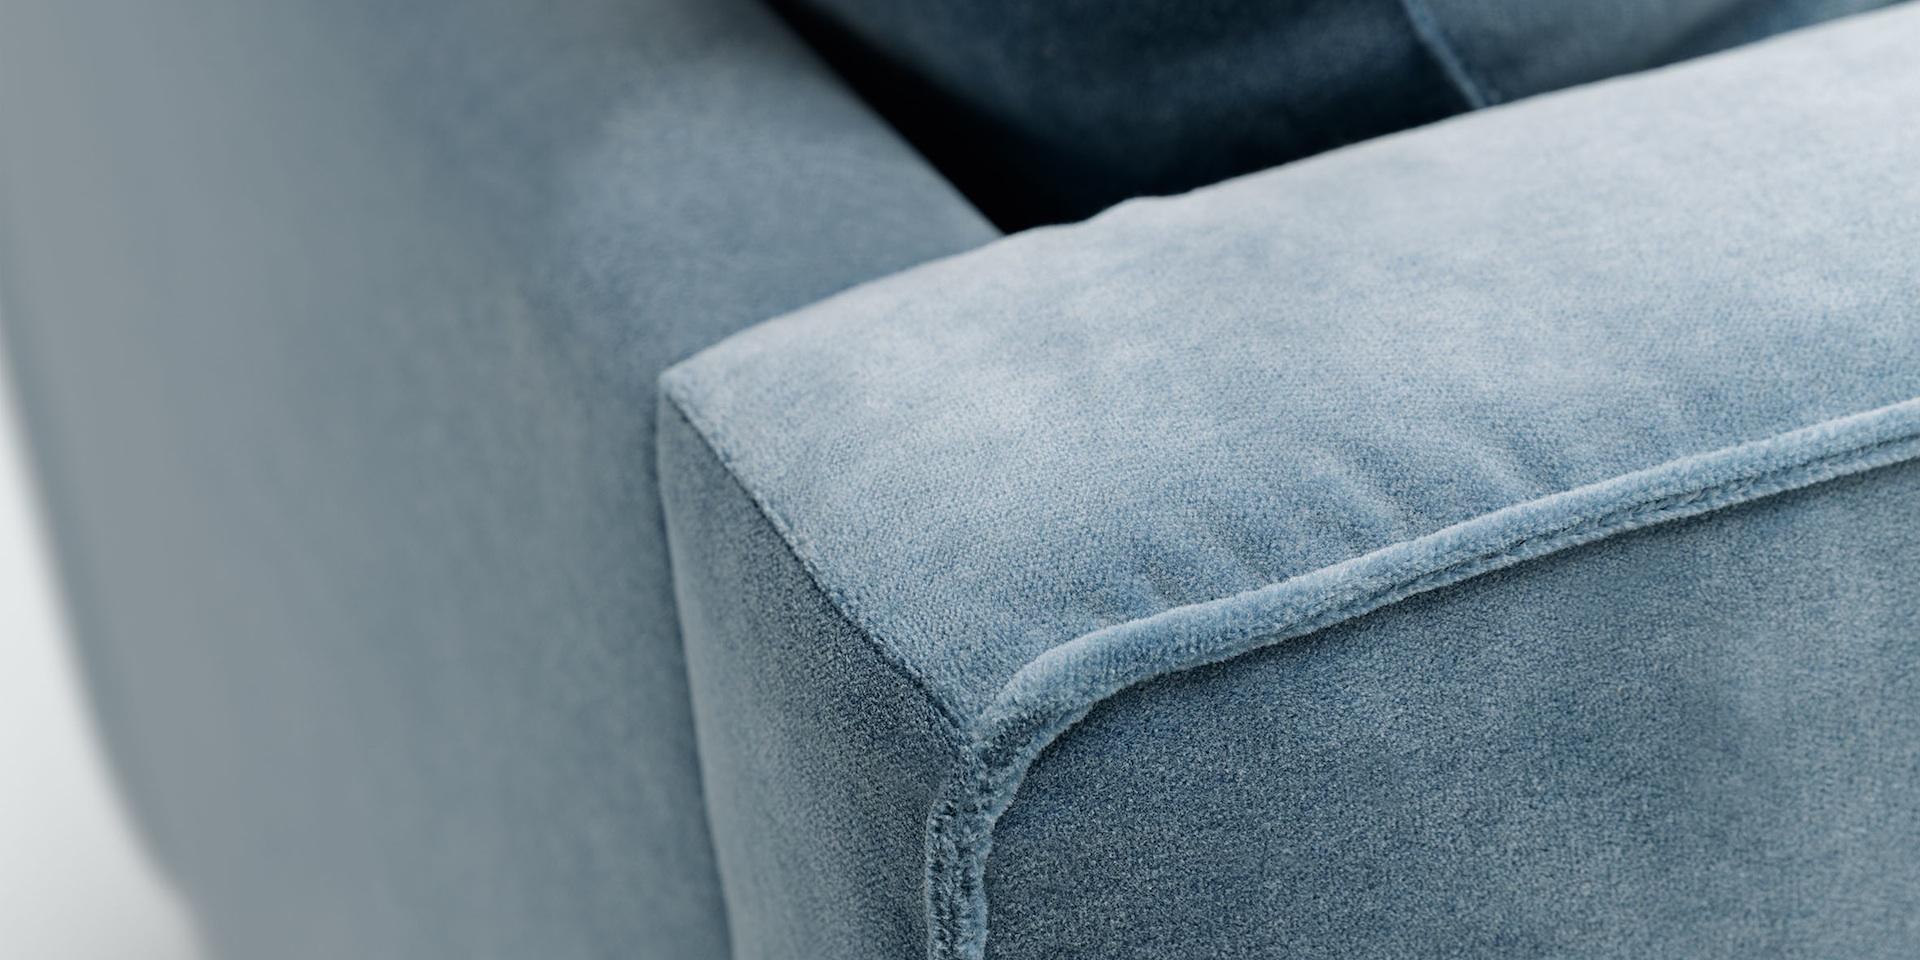 CAPRICE_shadow_armchair_malibu_velvet5_blue_5